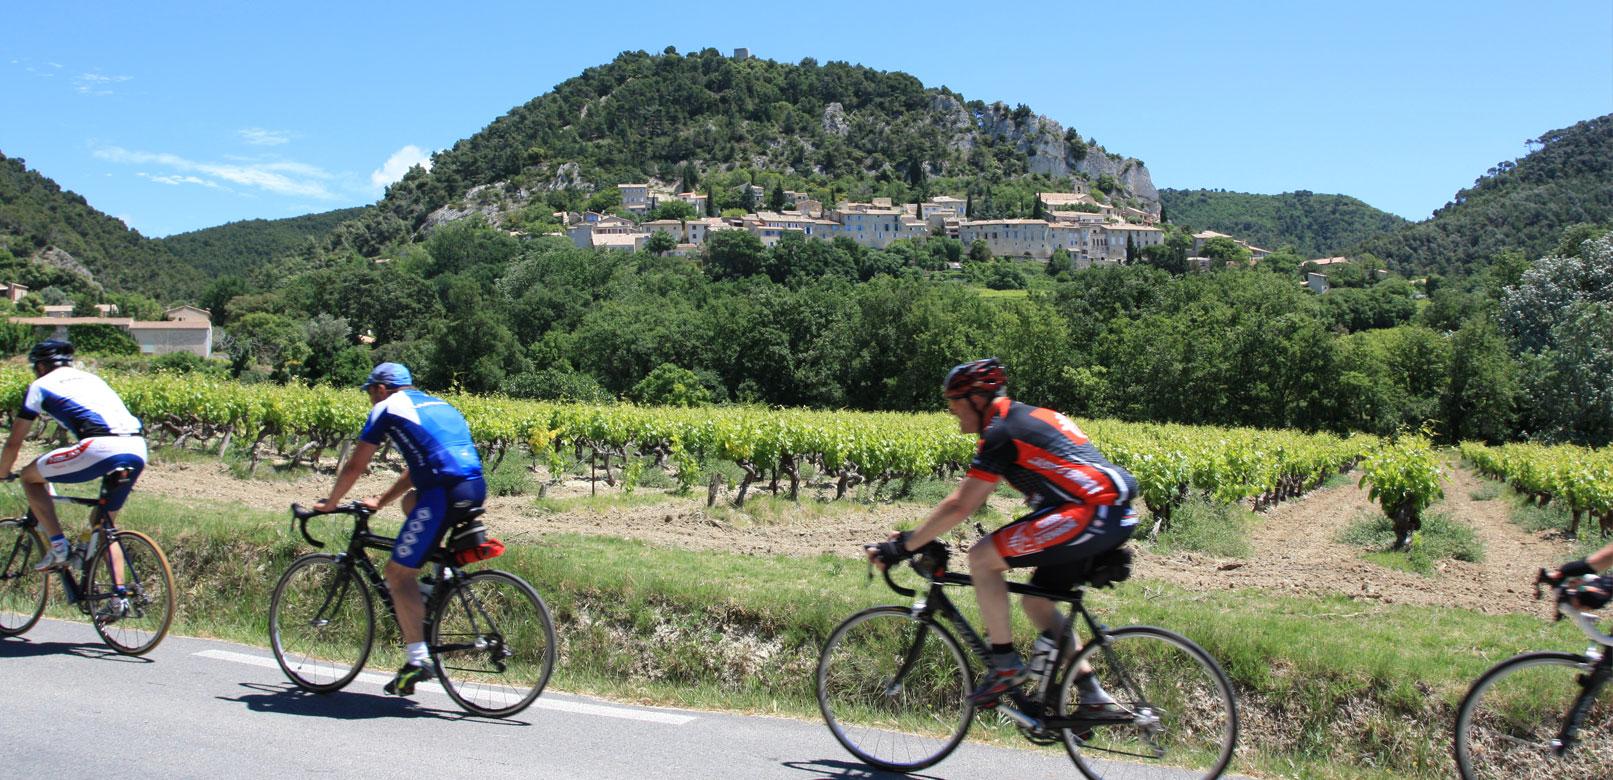 La vallée du Rhône à vélo @ Hocquel